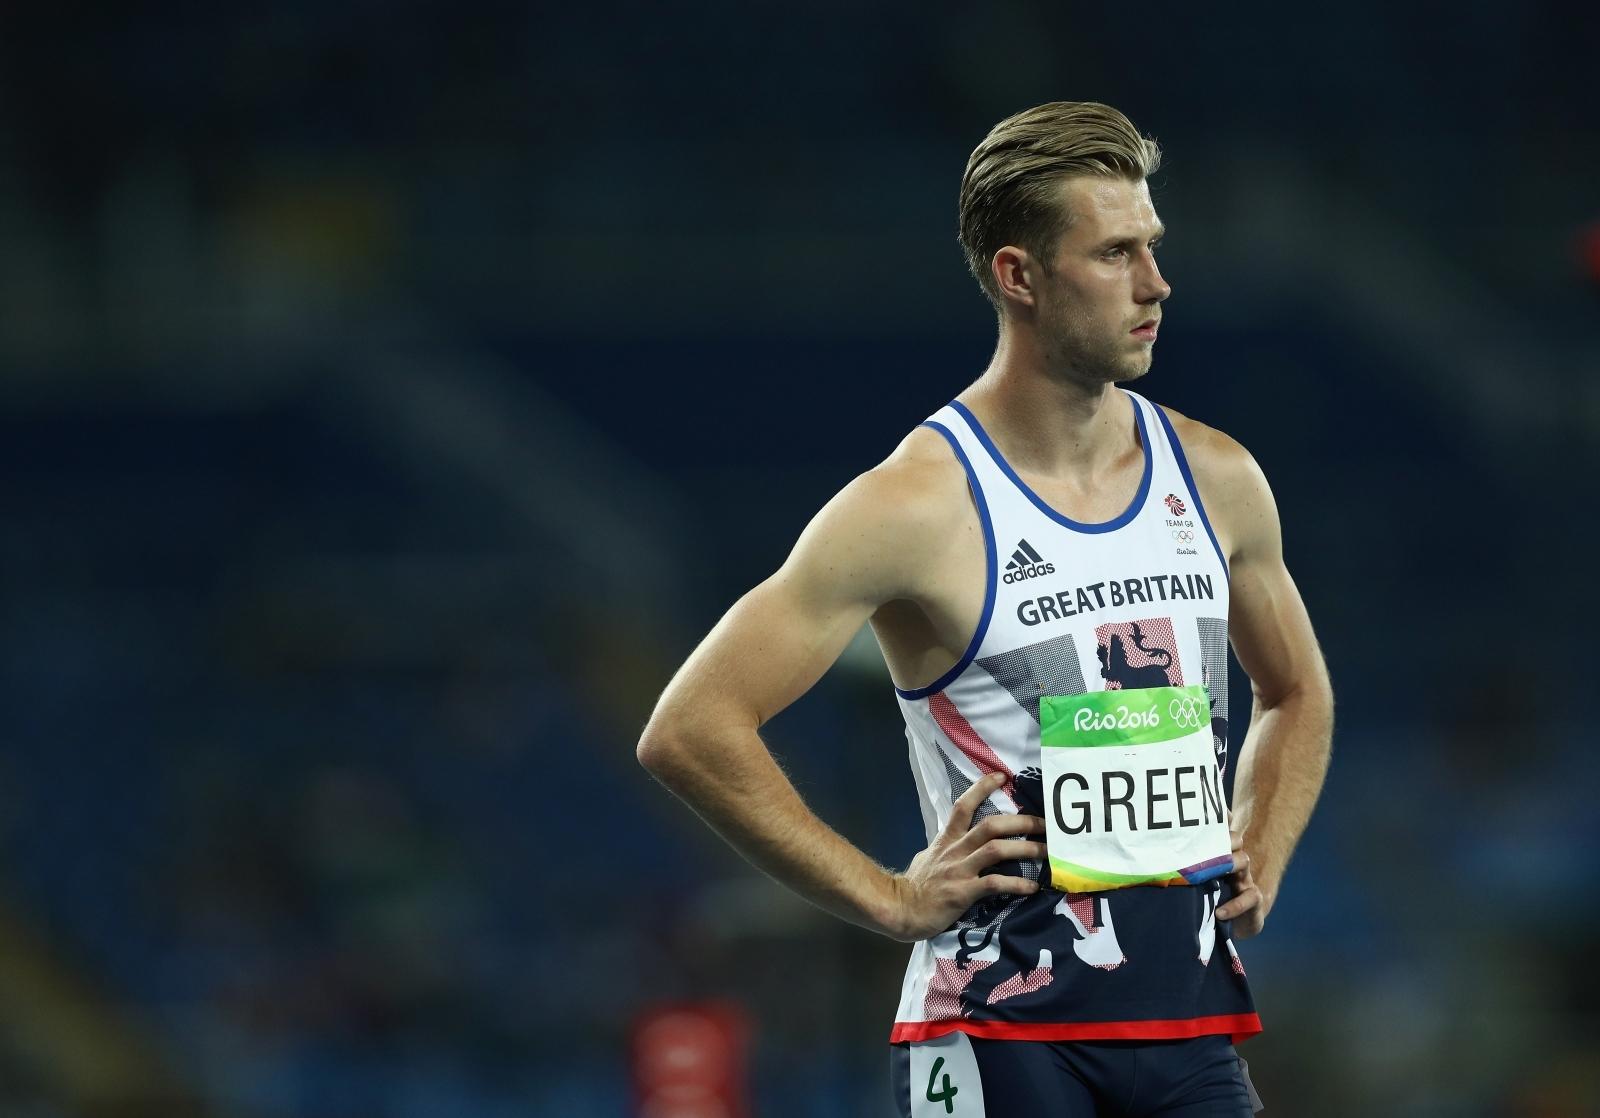 Jack Green Olympian